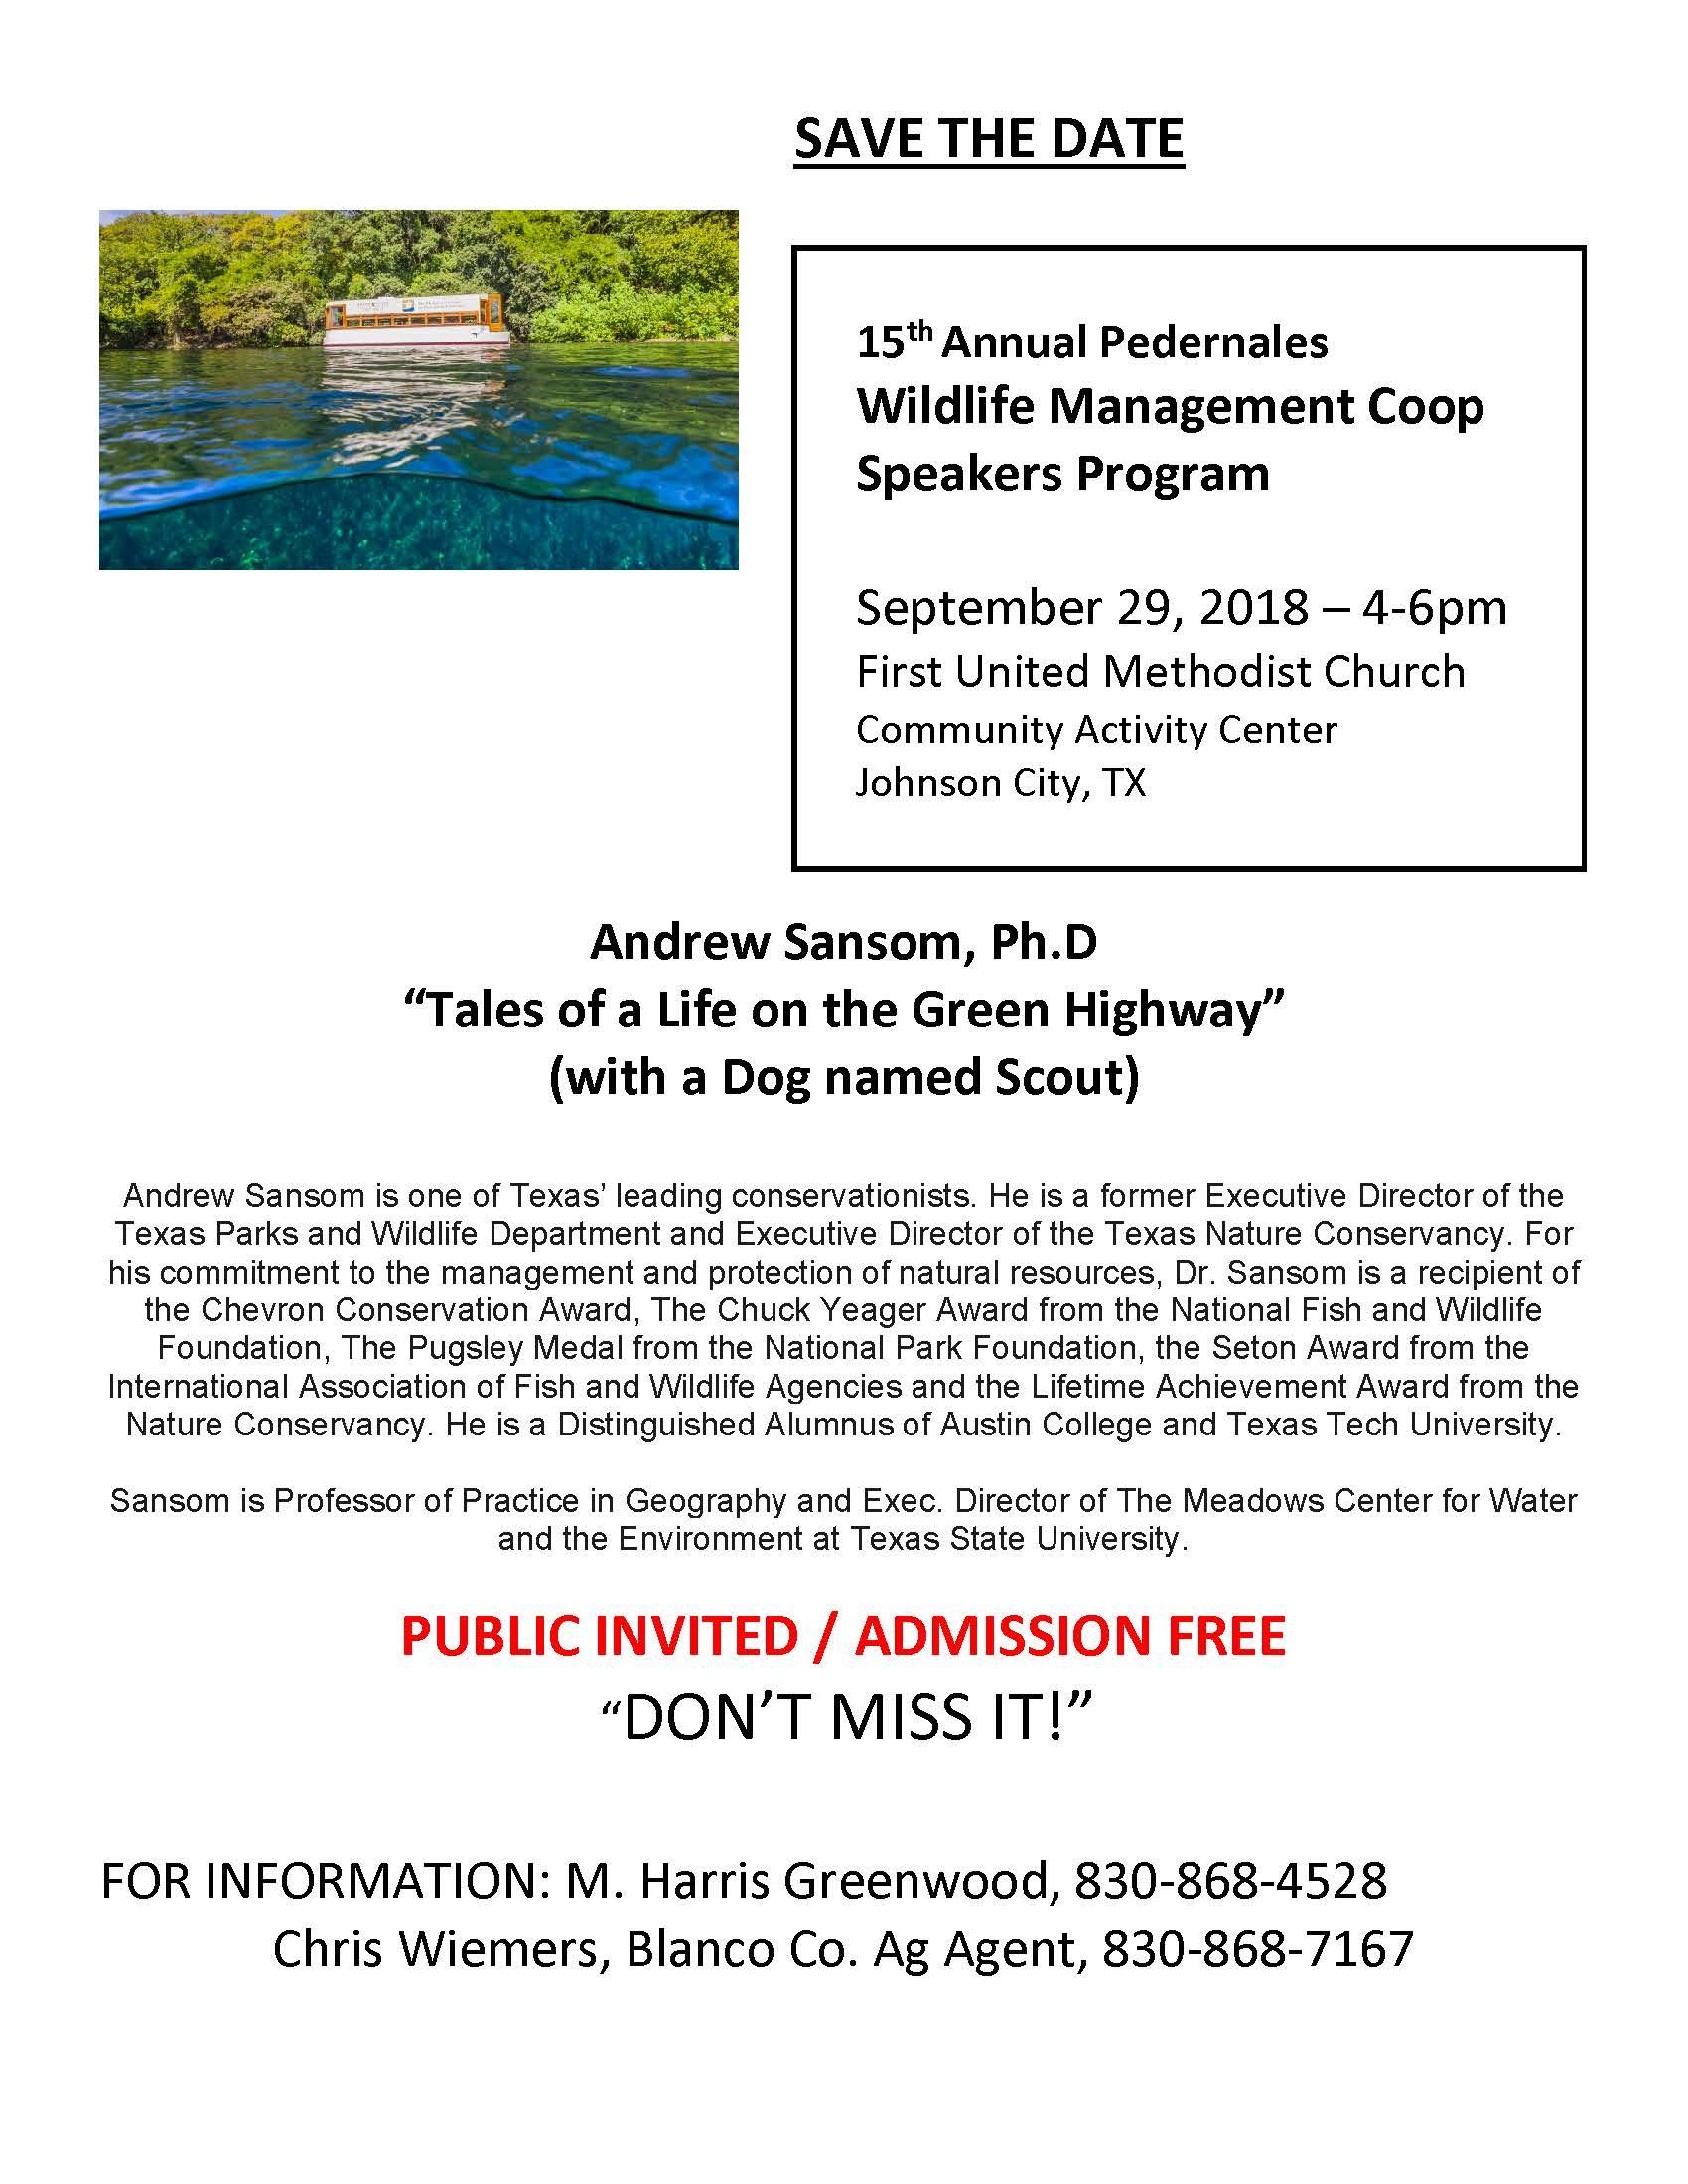 public speaking meadows center texas